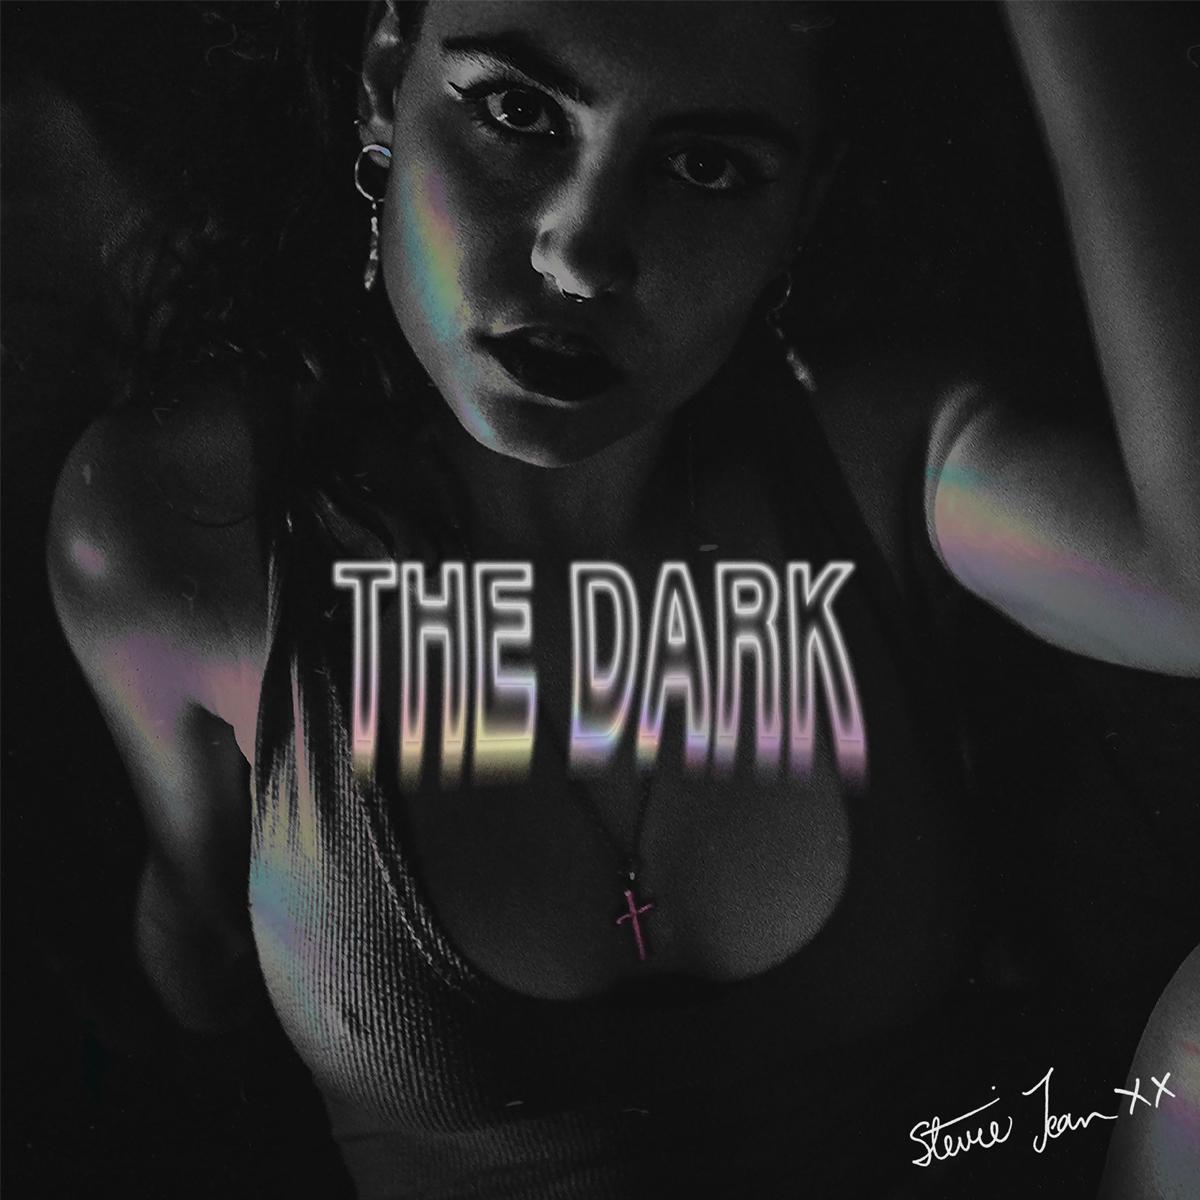 Stevie Jean The Dark album cover art